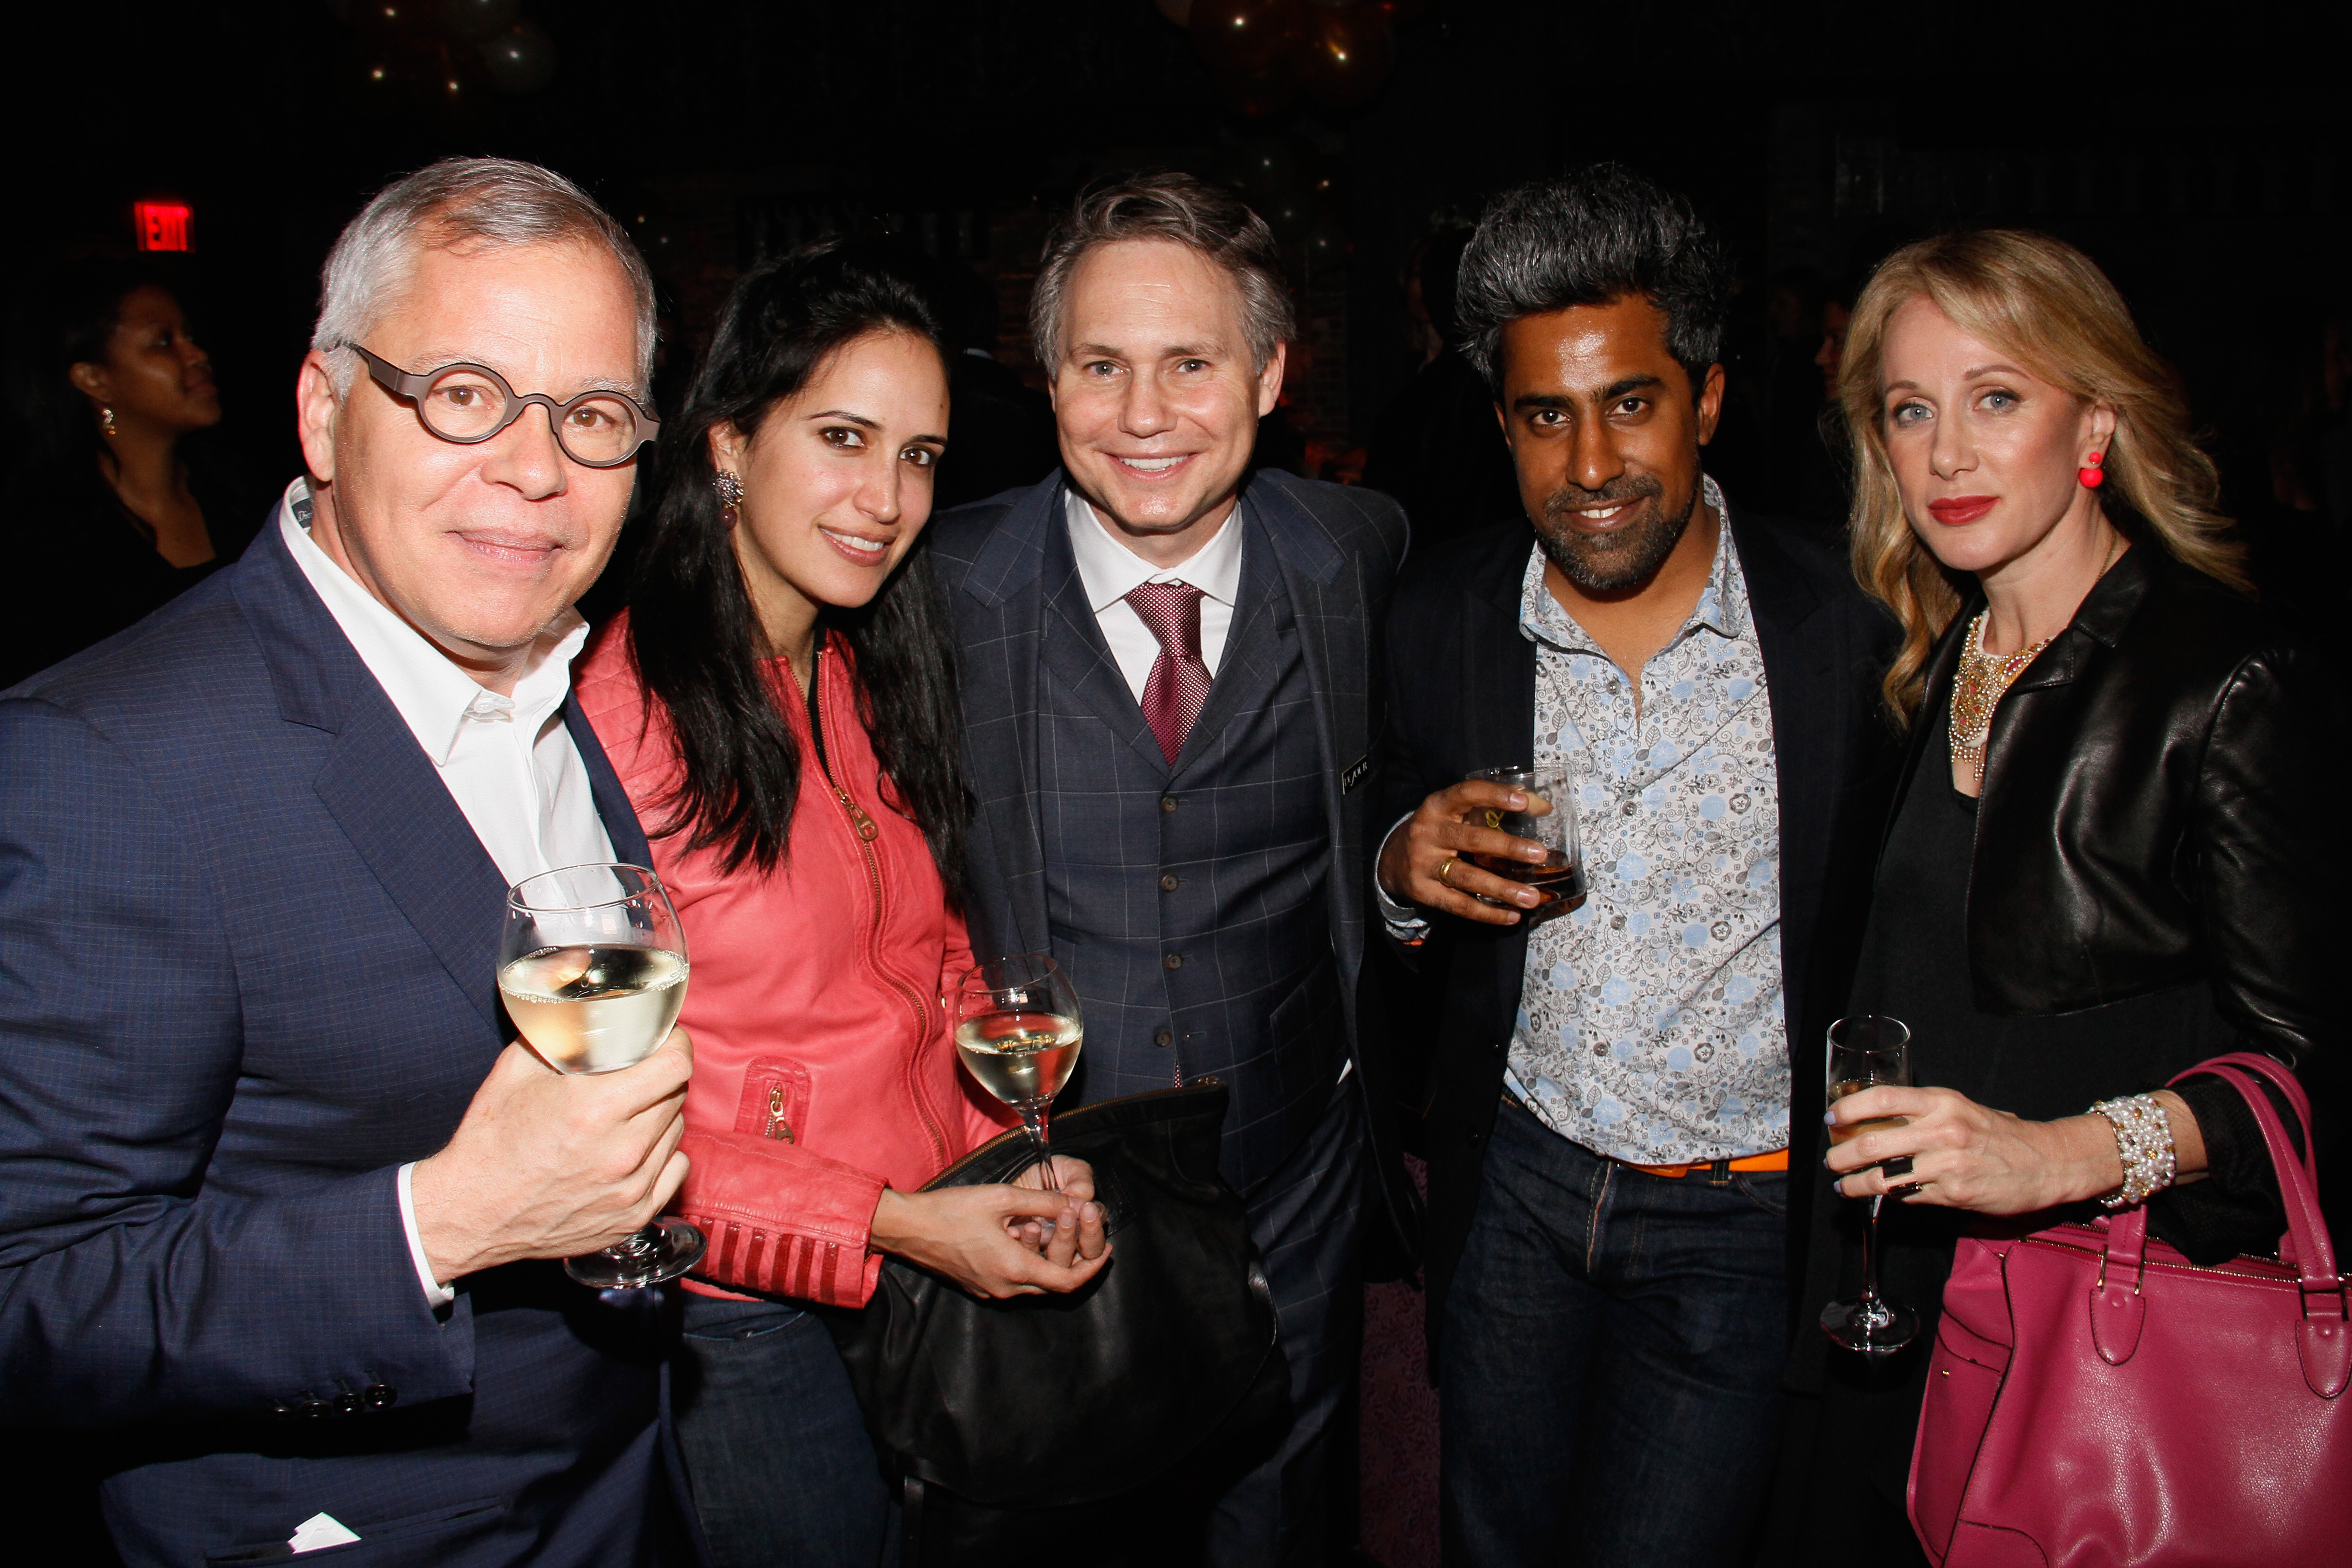 Jason Binn And DuJour Magazine Throw Surprise Birthday For Pauline Brown, Chairman Of LVMH For North America